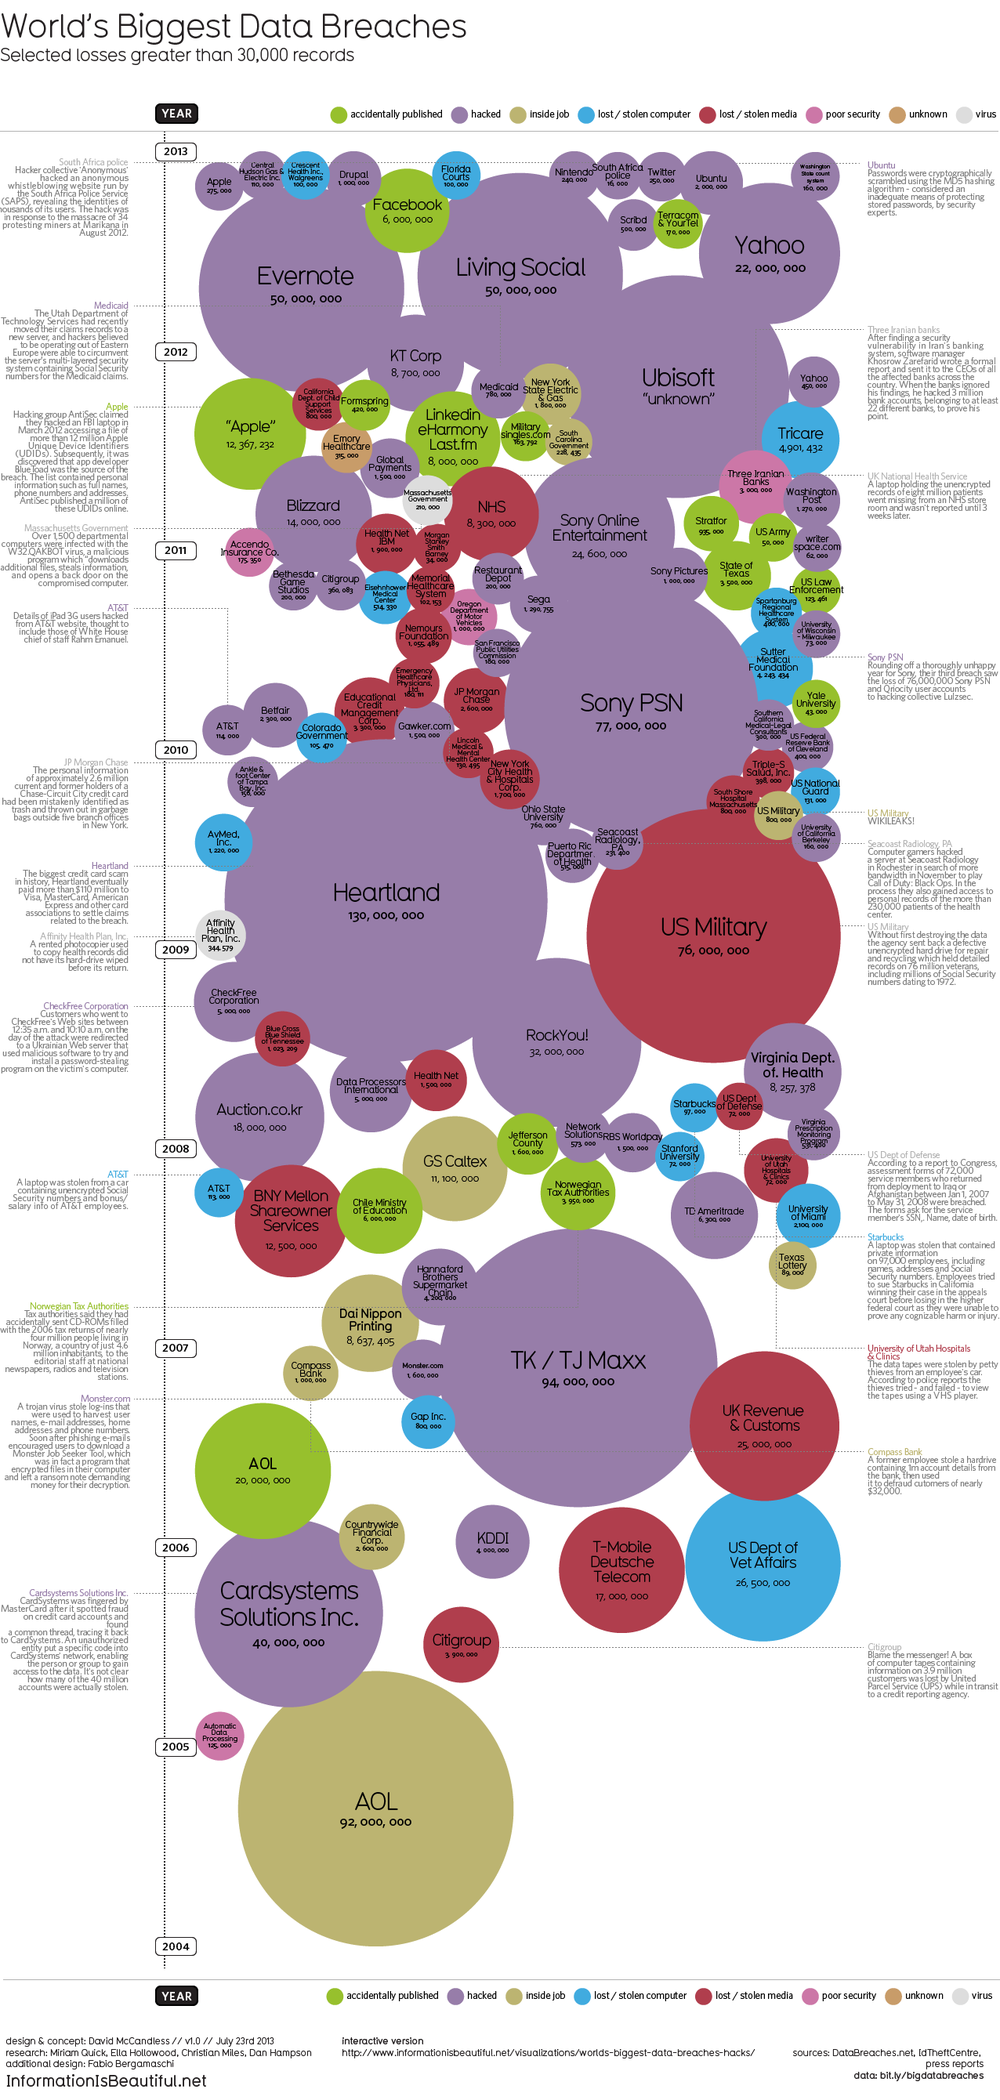 World's Biggest Data Breaches Visualization infographic